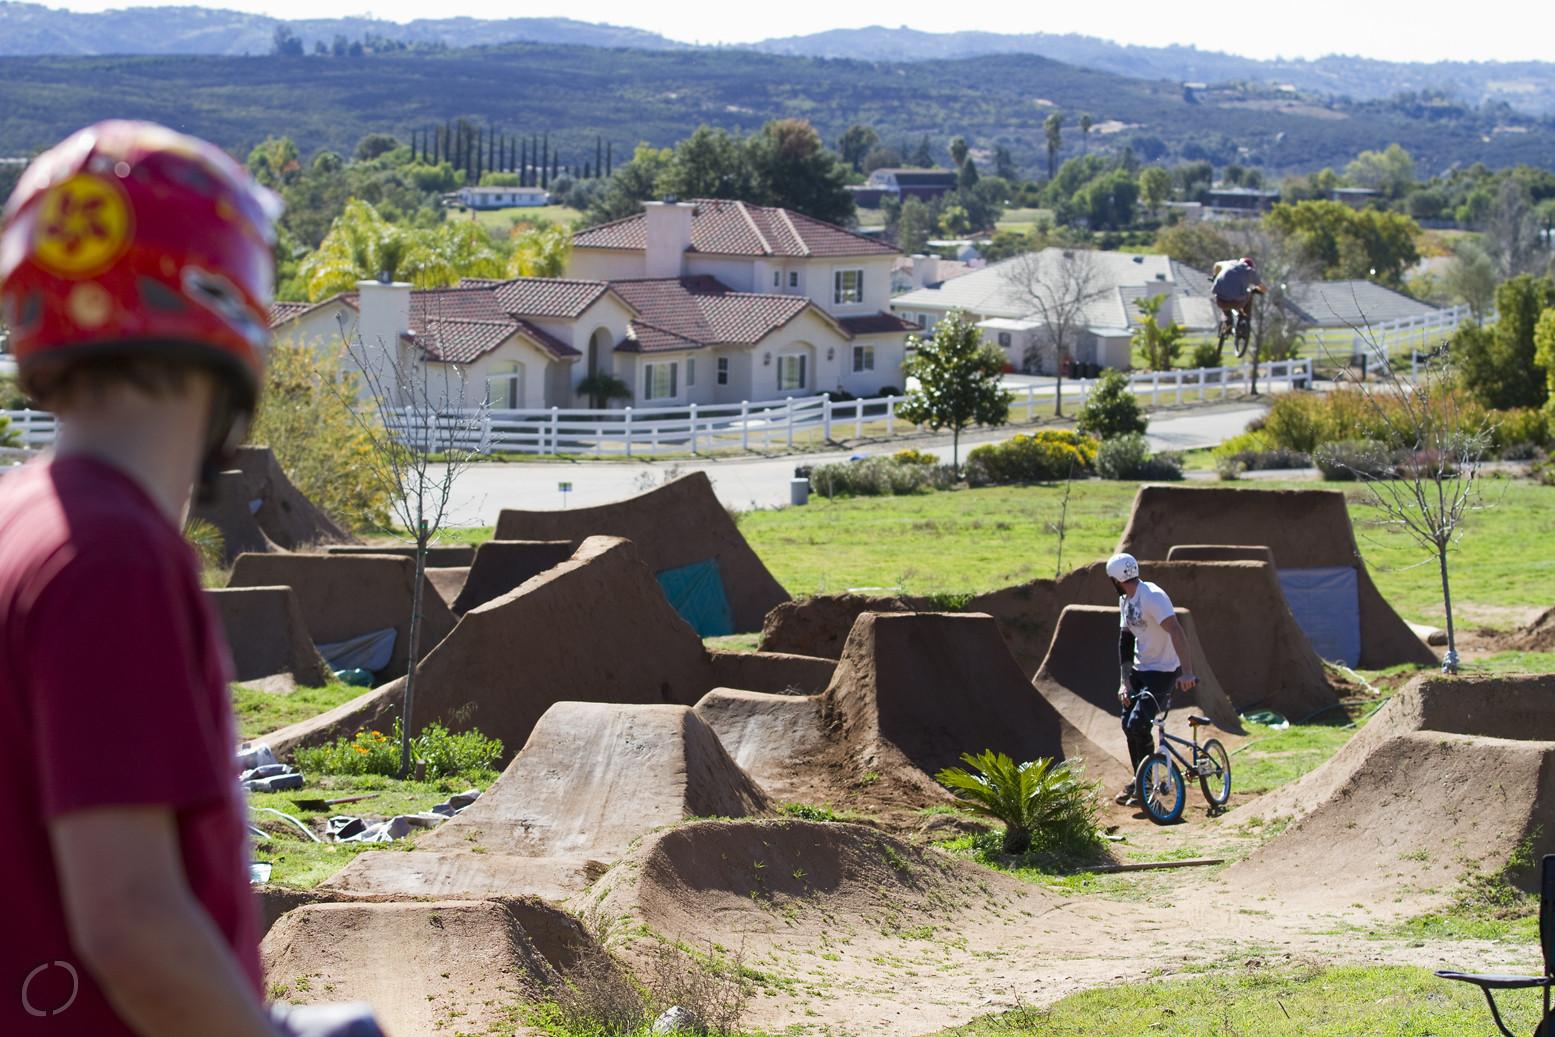 Blaine air - Captures by Carman - Mountain Biking Pictures - Vital MTB